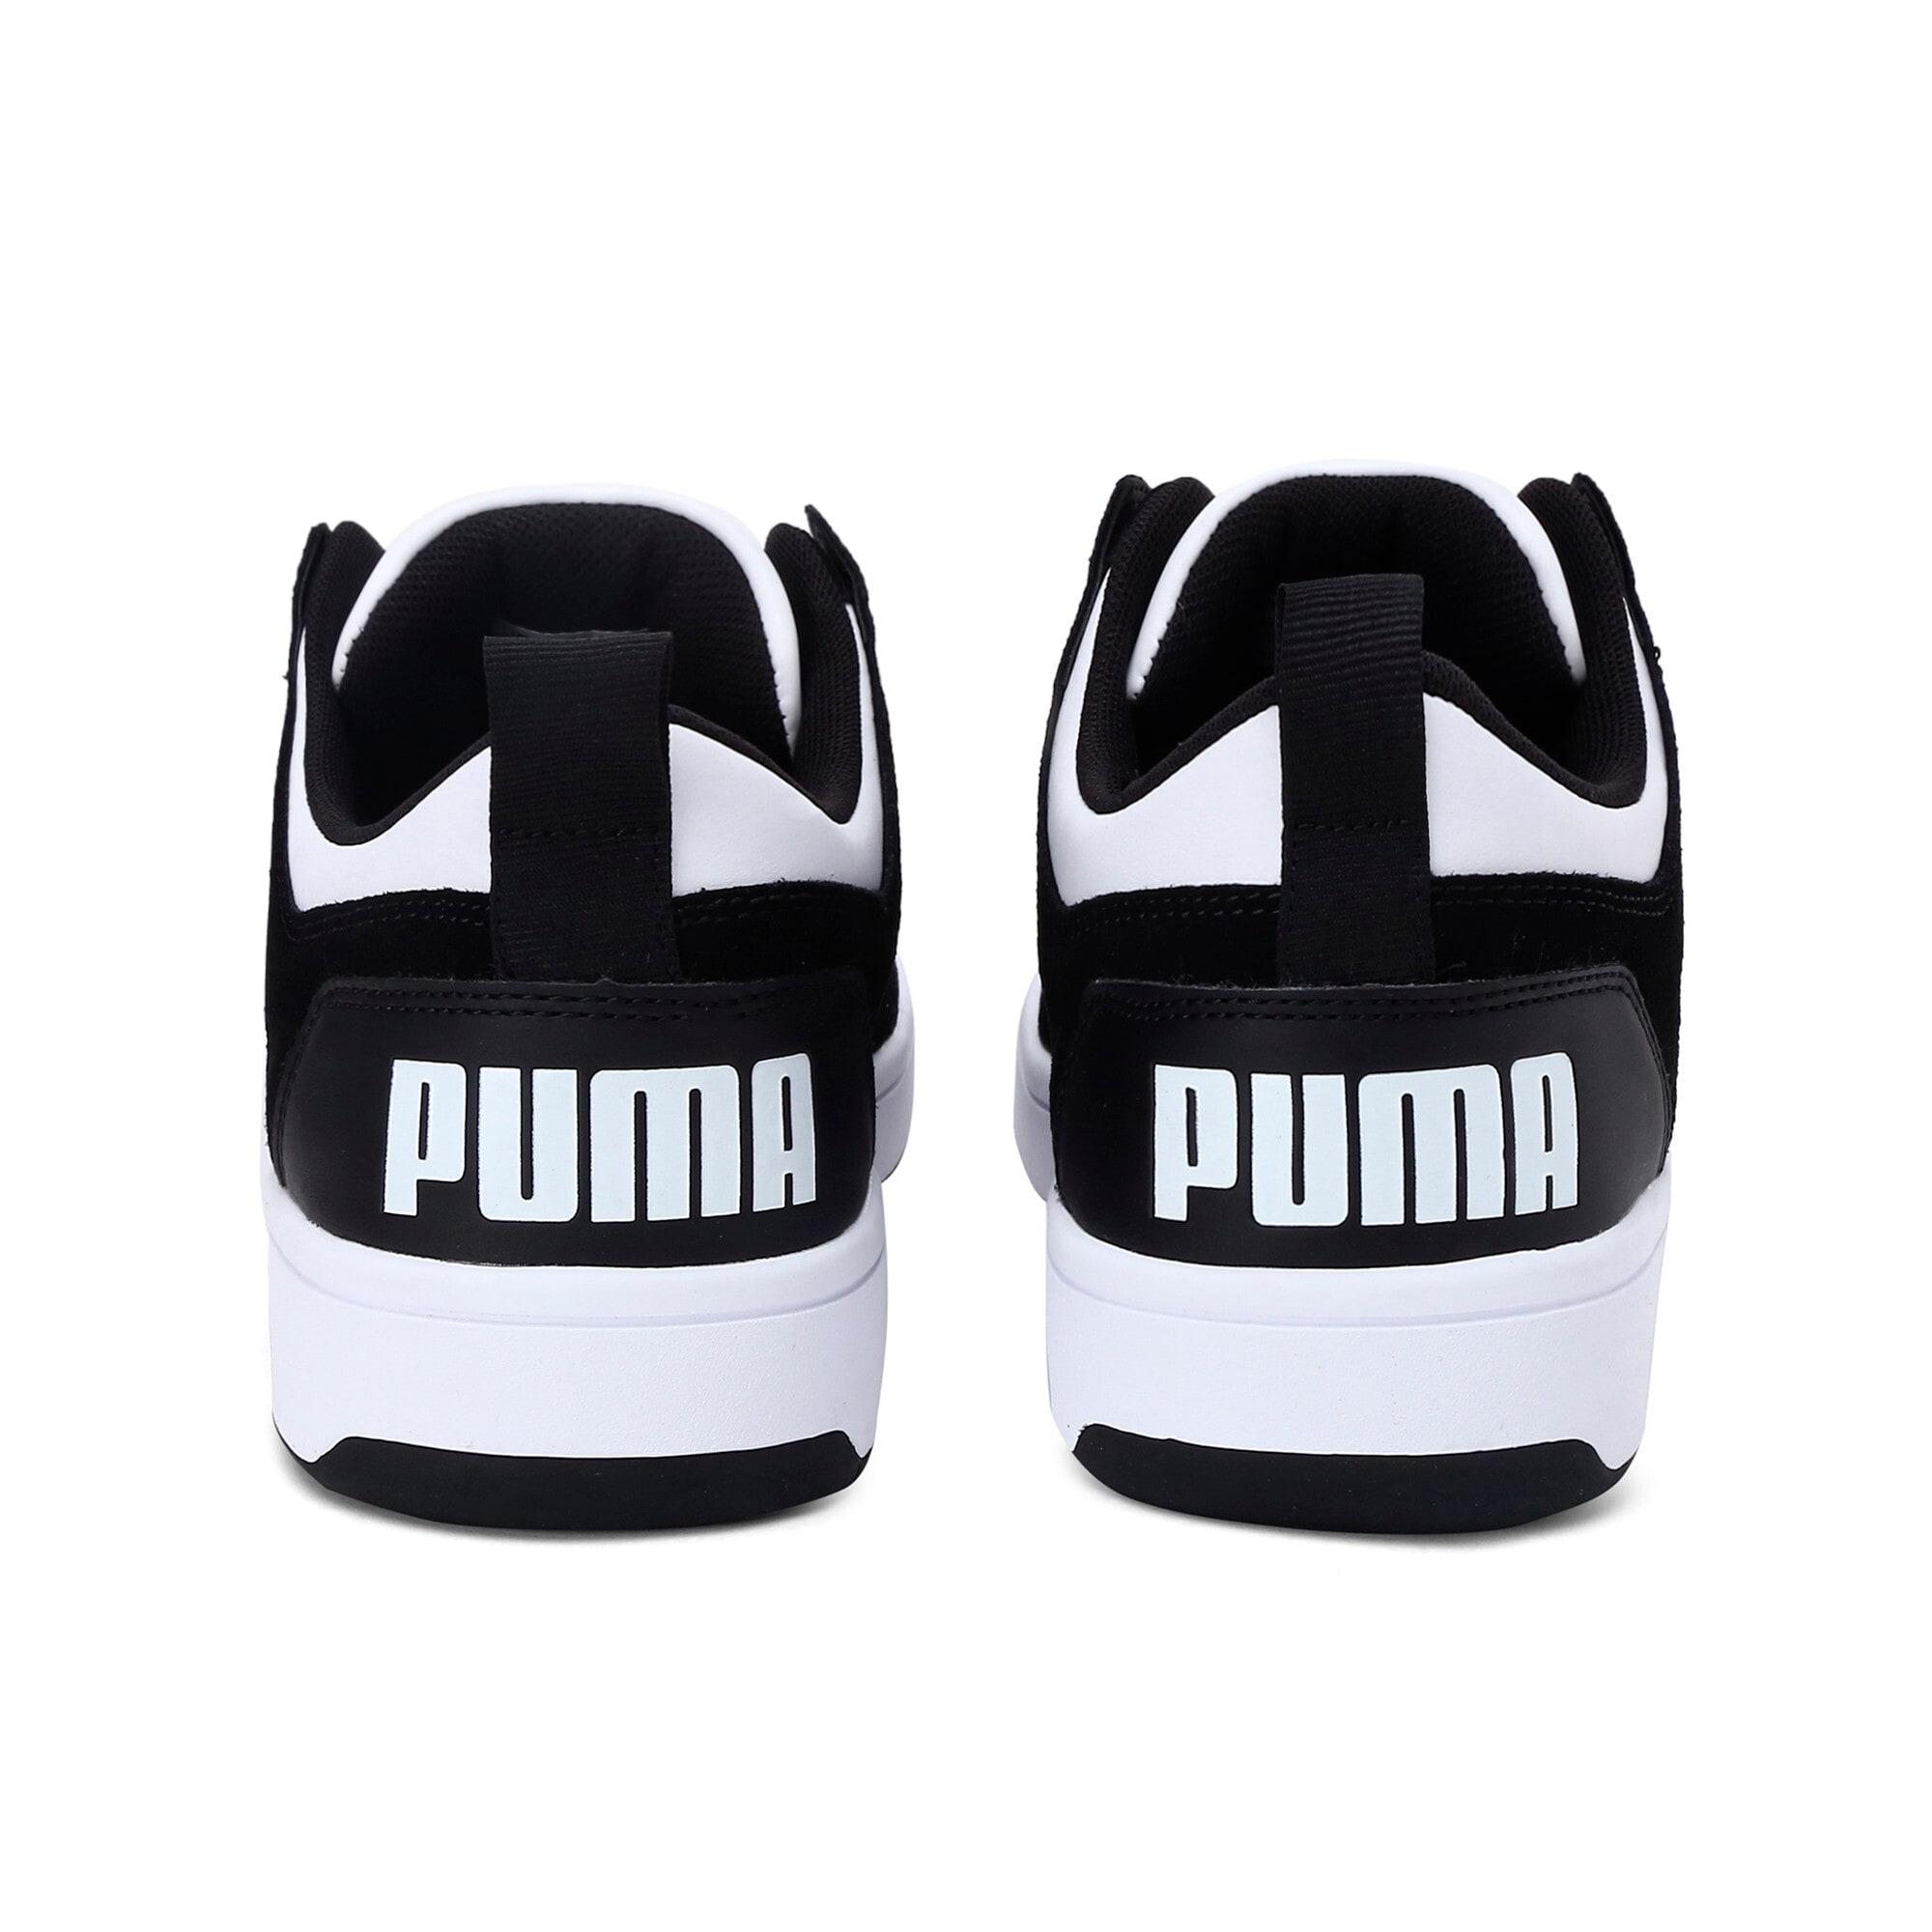 Thumbnail 4 of Rebound Lay-Up Lo SD Trainers, Puma Black-Puma White, medium-IND